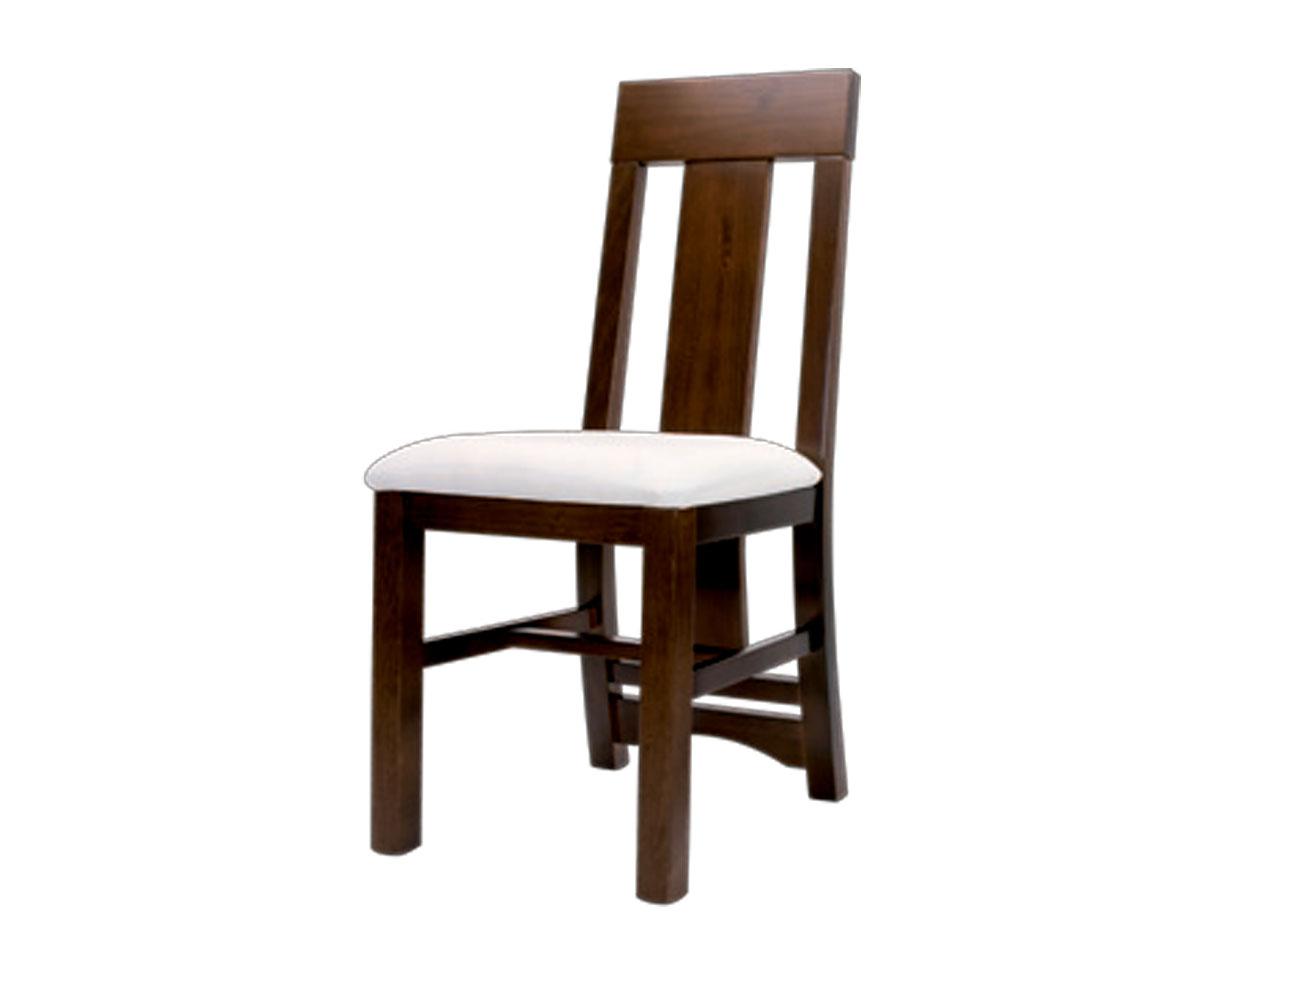 C0 51 silla madera tapizada1